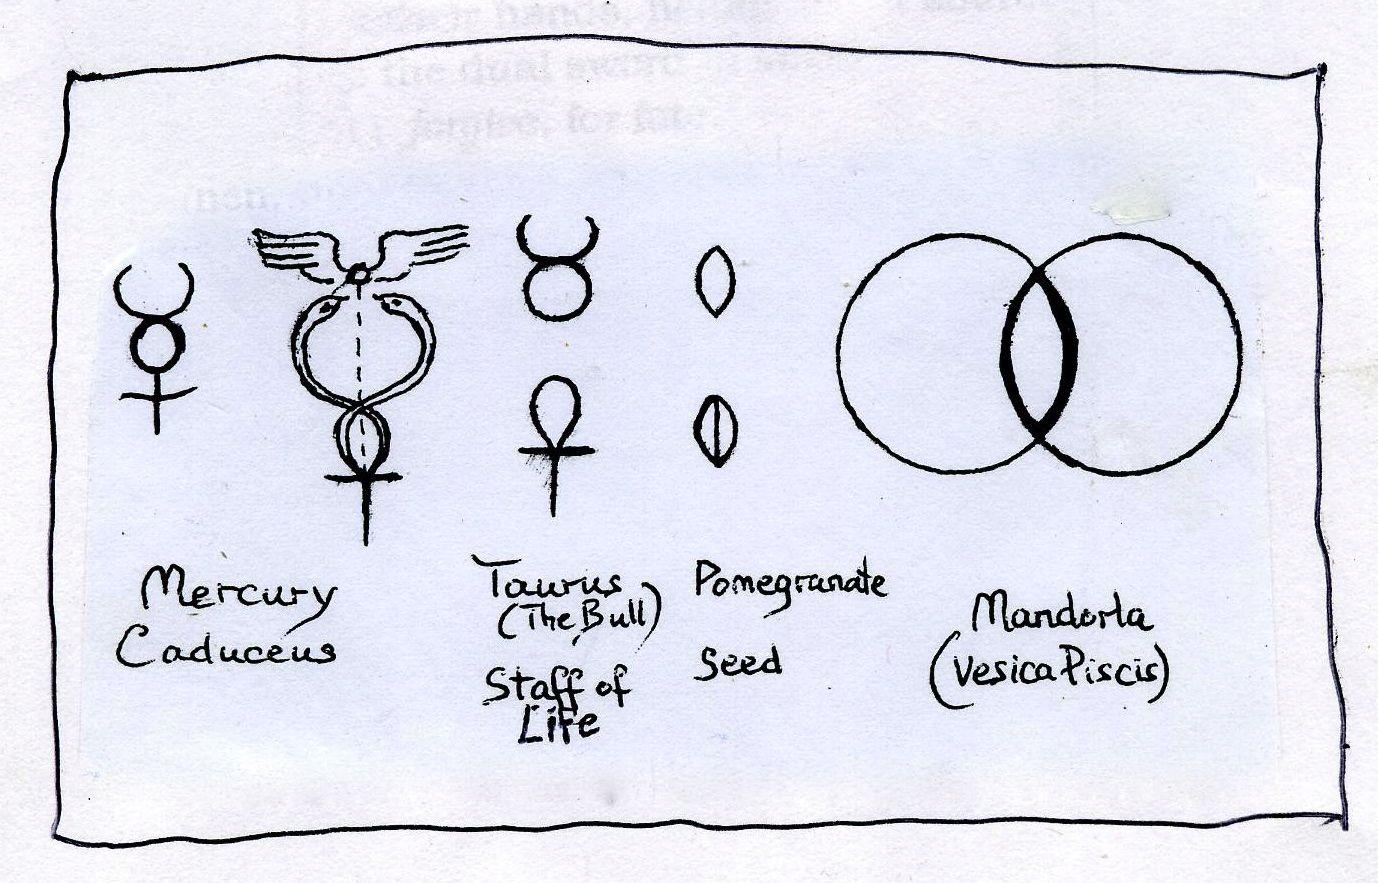 5-polarity-mercury-staff-mandorla.jpg (1378×883)